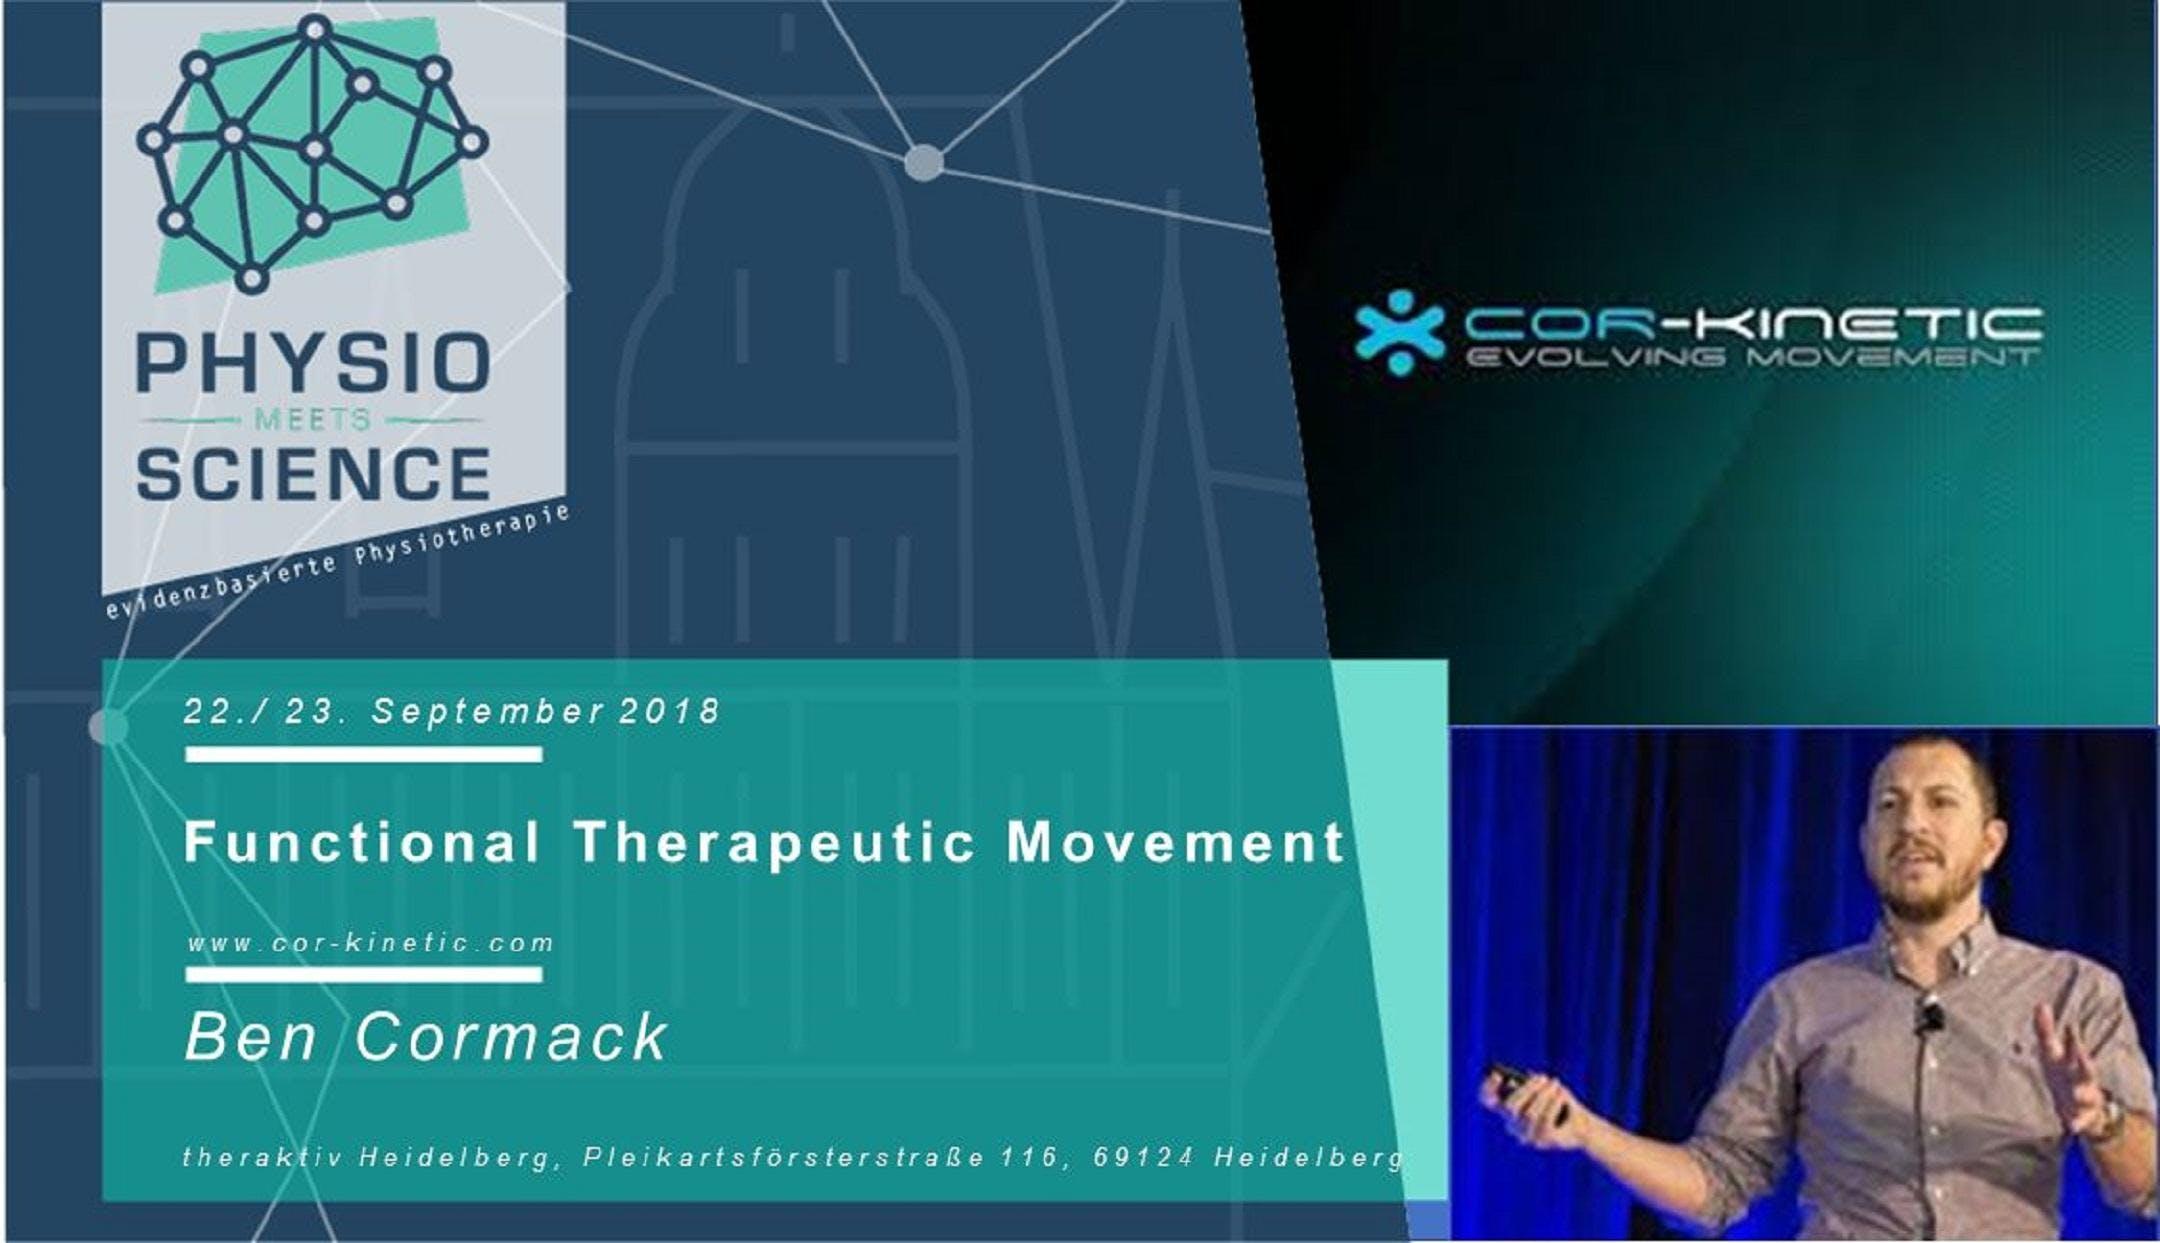 BEN CORMACK: Functional Therapeutic Movement